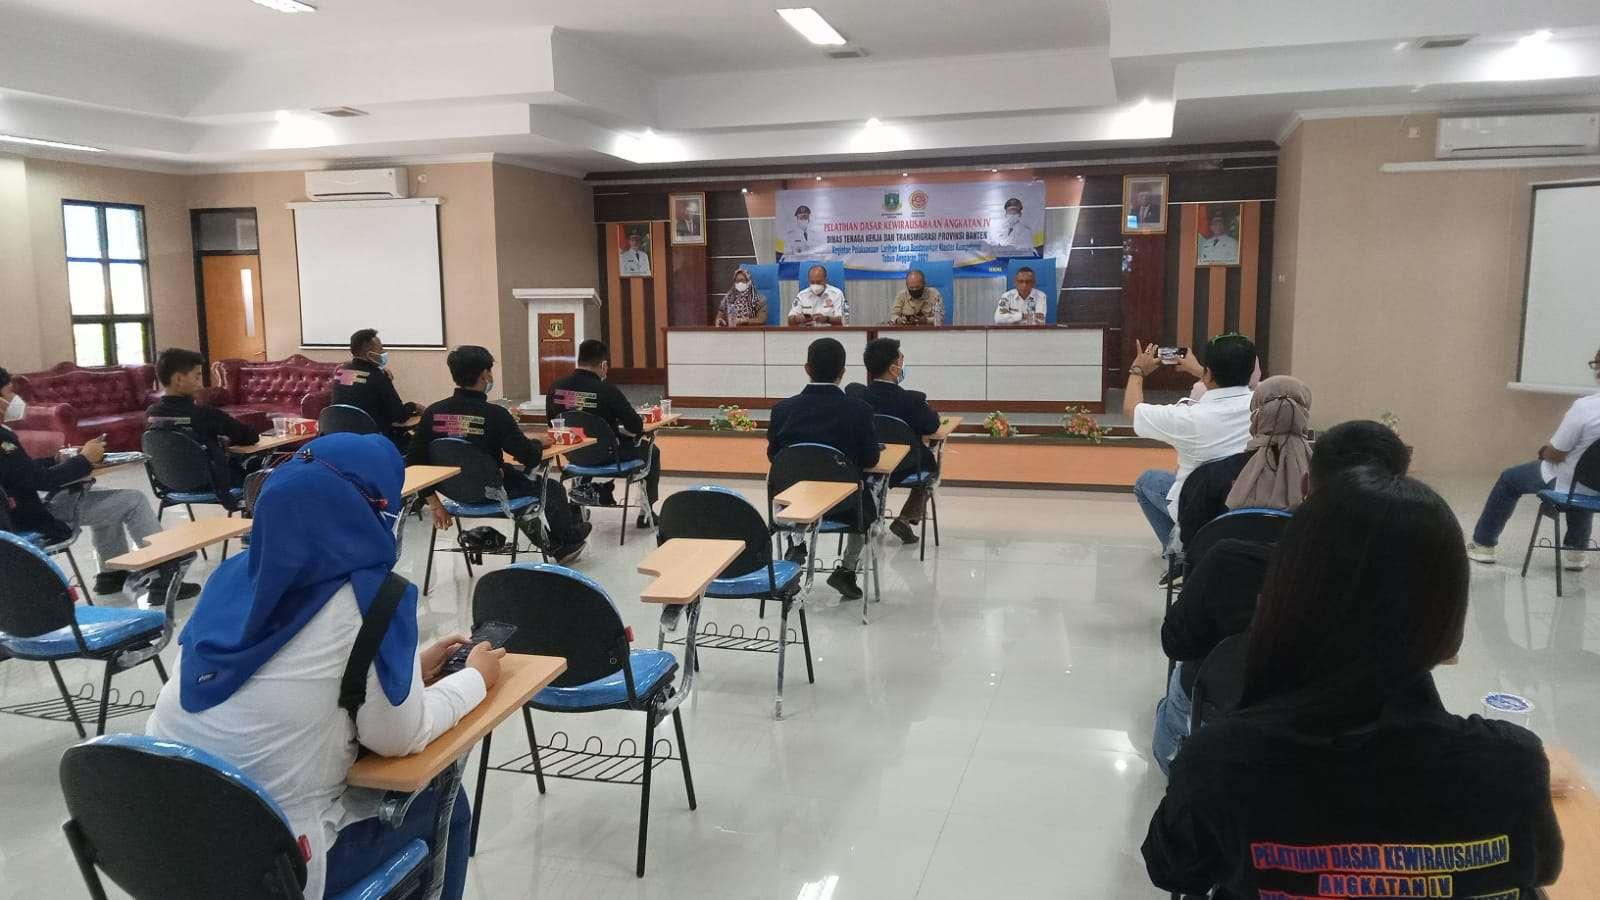 Dibawah kepemimpinan Andika Hazrumy, Karang Taruna Provinsi Banten bersama Disnaker Banten mendorong lahirnya pengusaha muda